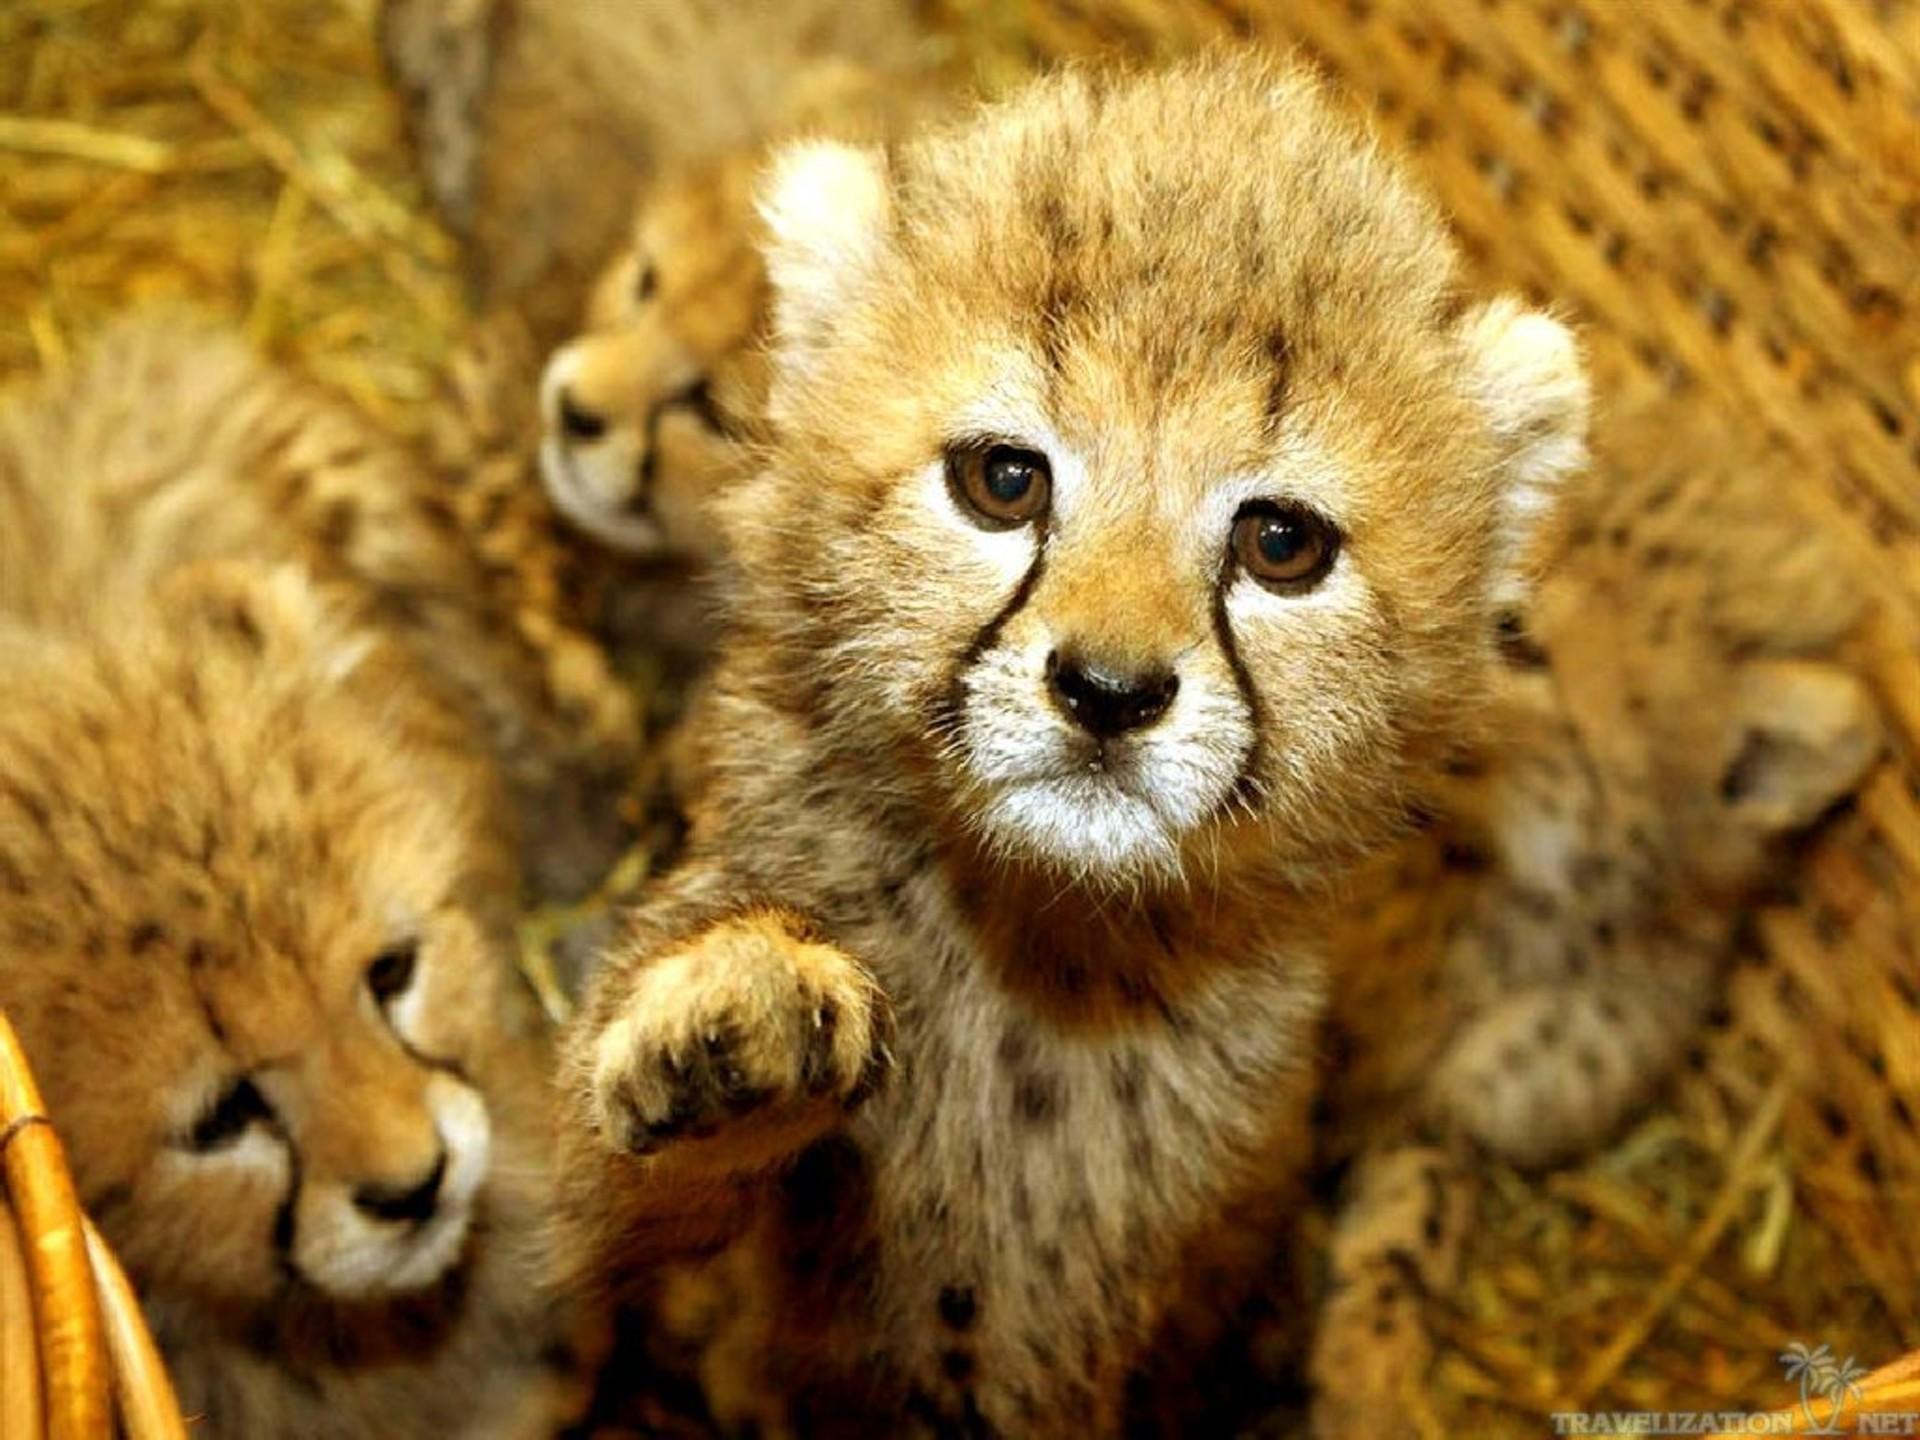 Desktop Wallpapers : Cute Baby Tiget Animals Wallpapers .